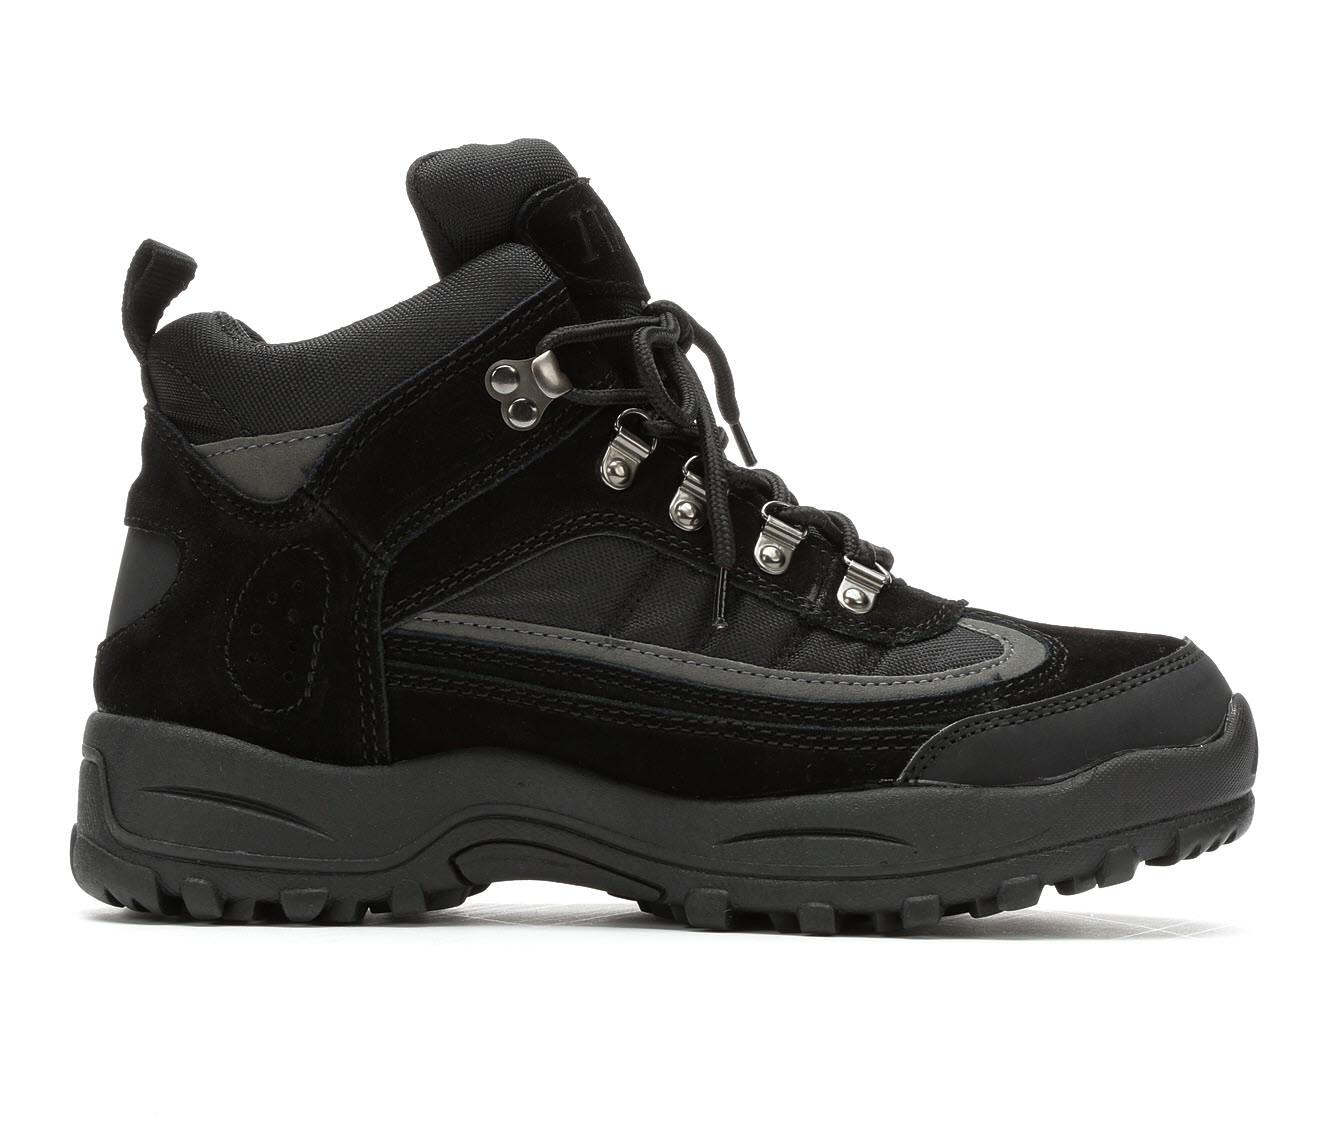 Itasca Sonoma Brazil Men's Boots (Black Leather)